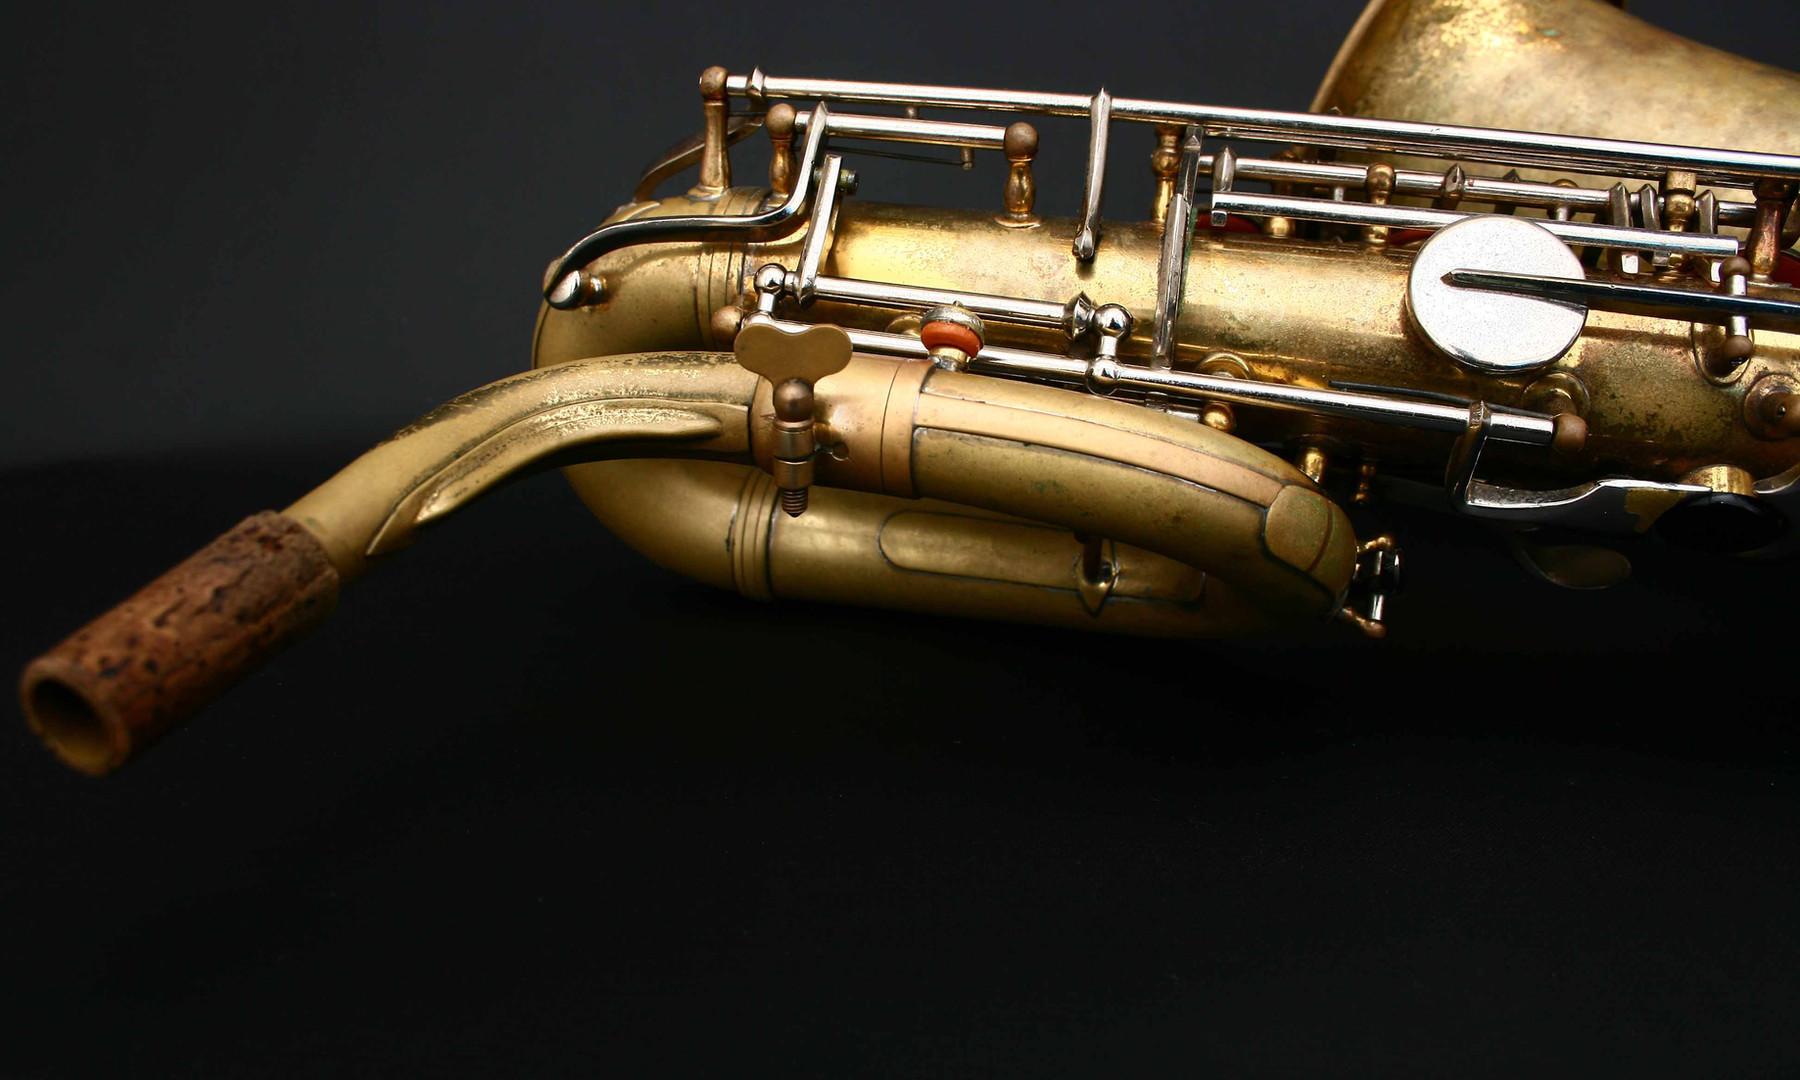 Baritonsaxophon Weltklang - Saxophon Manufaktur Marx